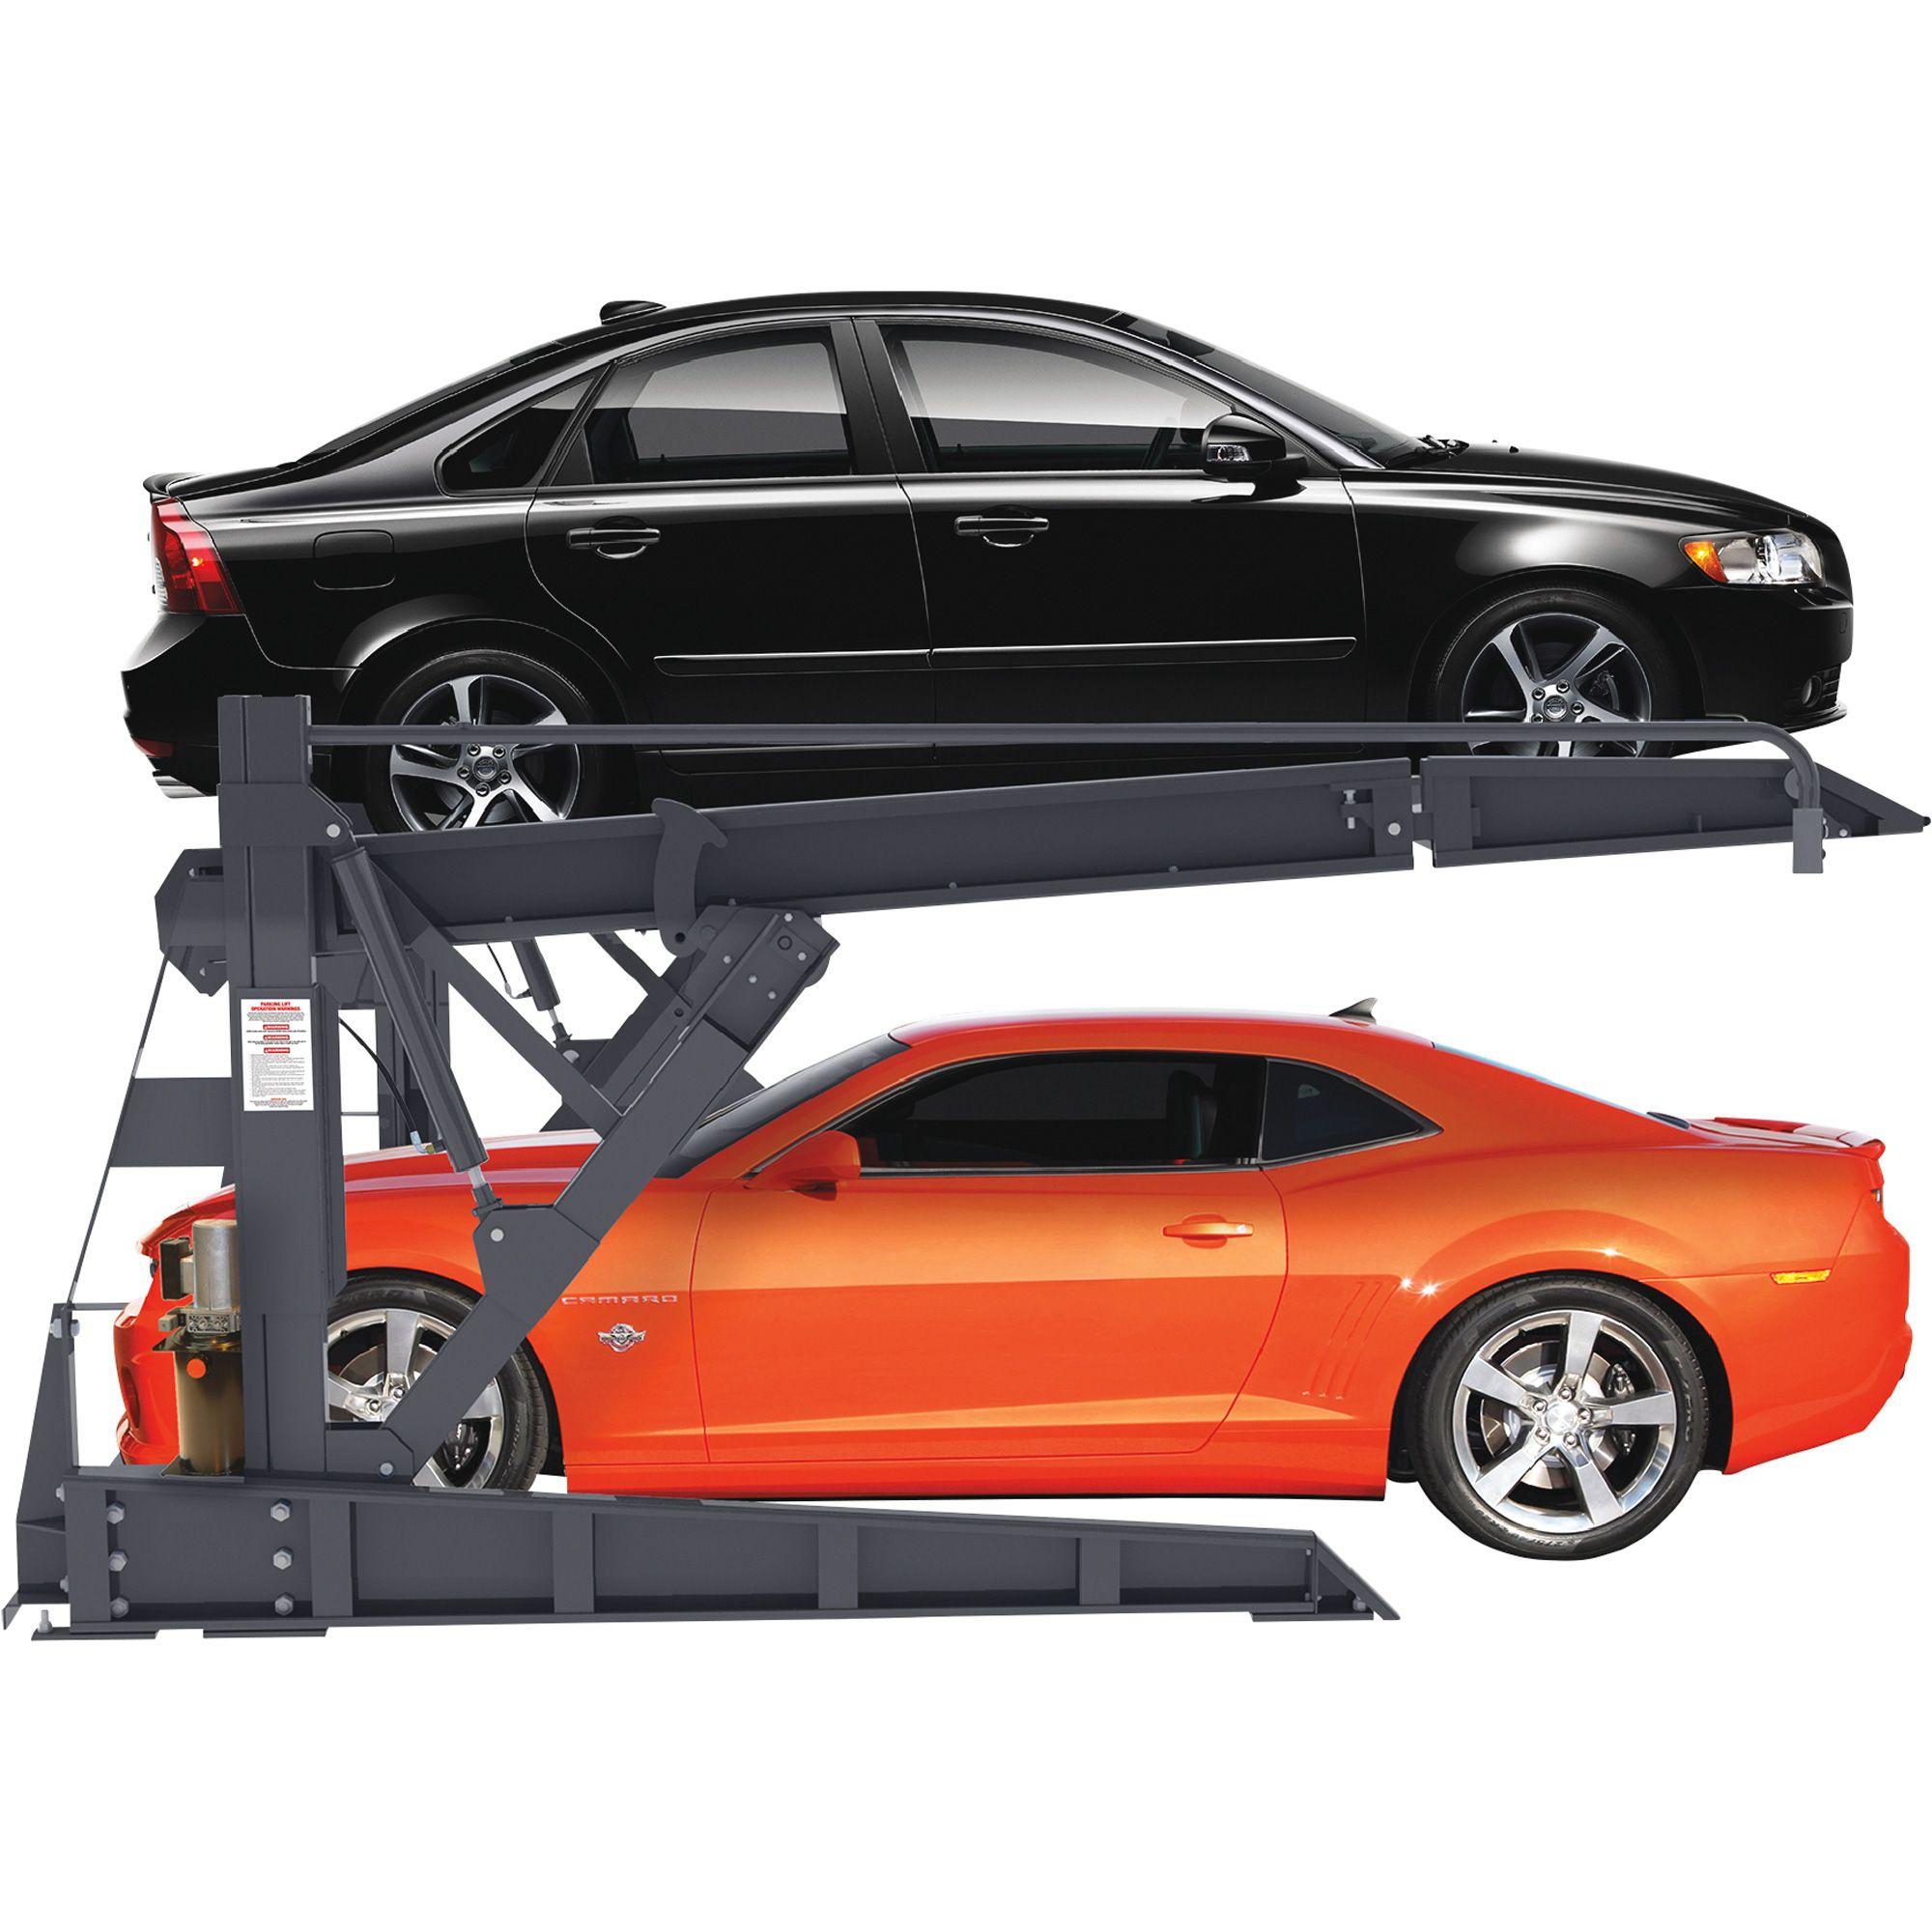 Free Shipping Bendpak 2 Post Tilt Platform Car Stacker Parking Lift 6000 Lb Capacity Model Plt 6s Two Post Lifts Northern Car Car Parking Car Stacker